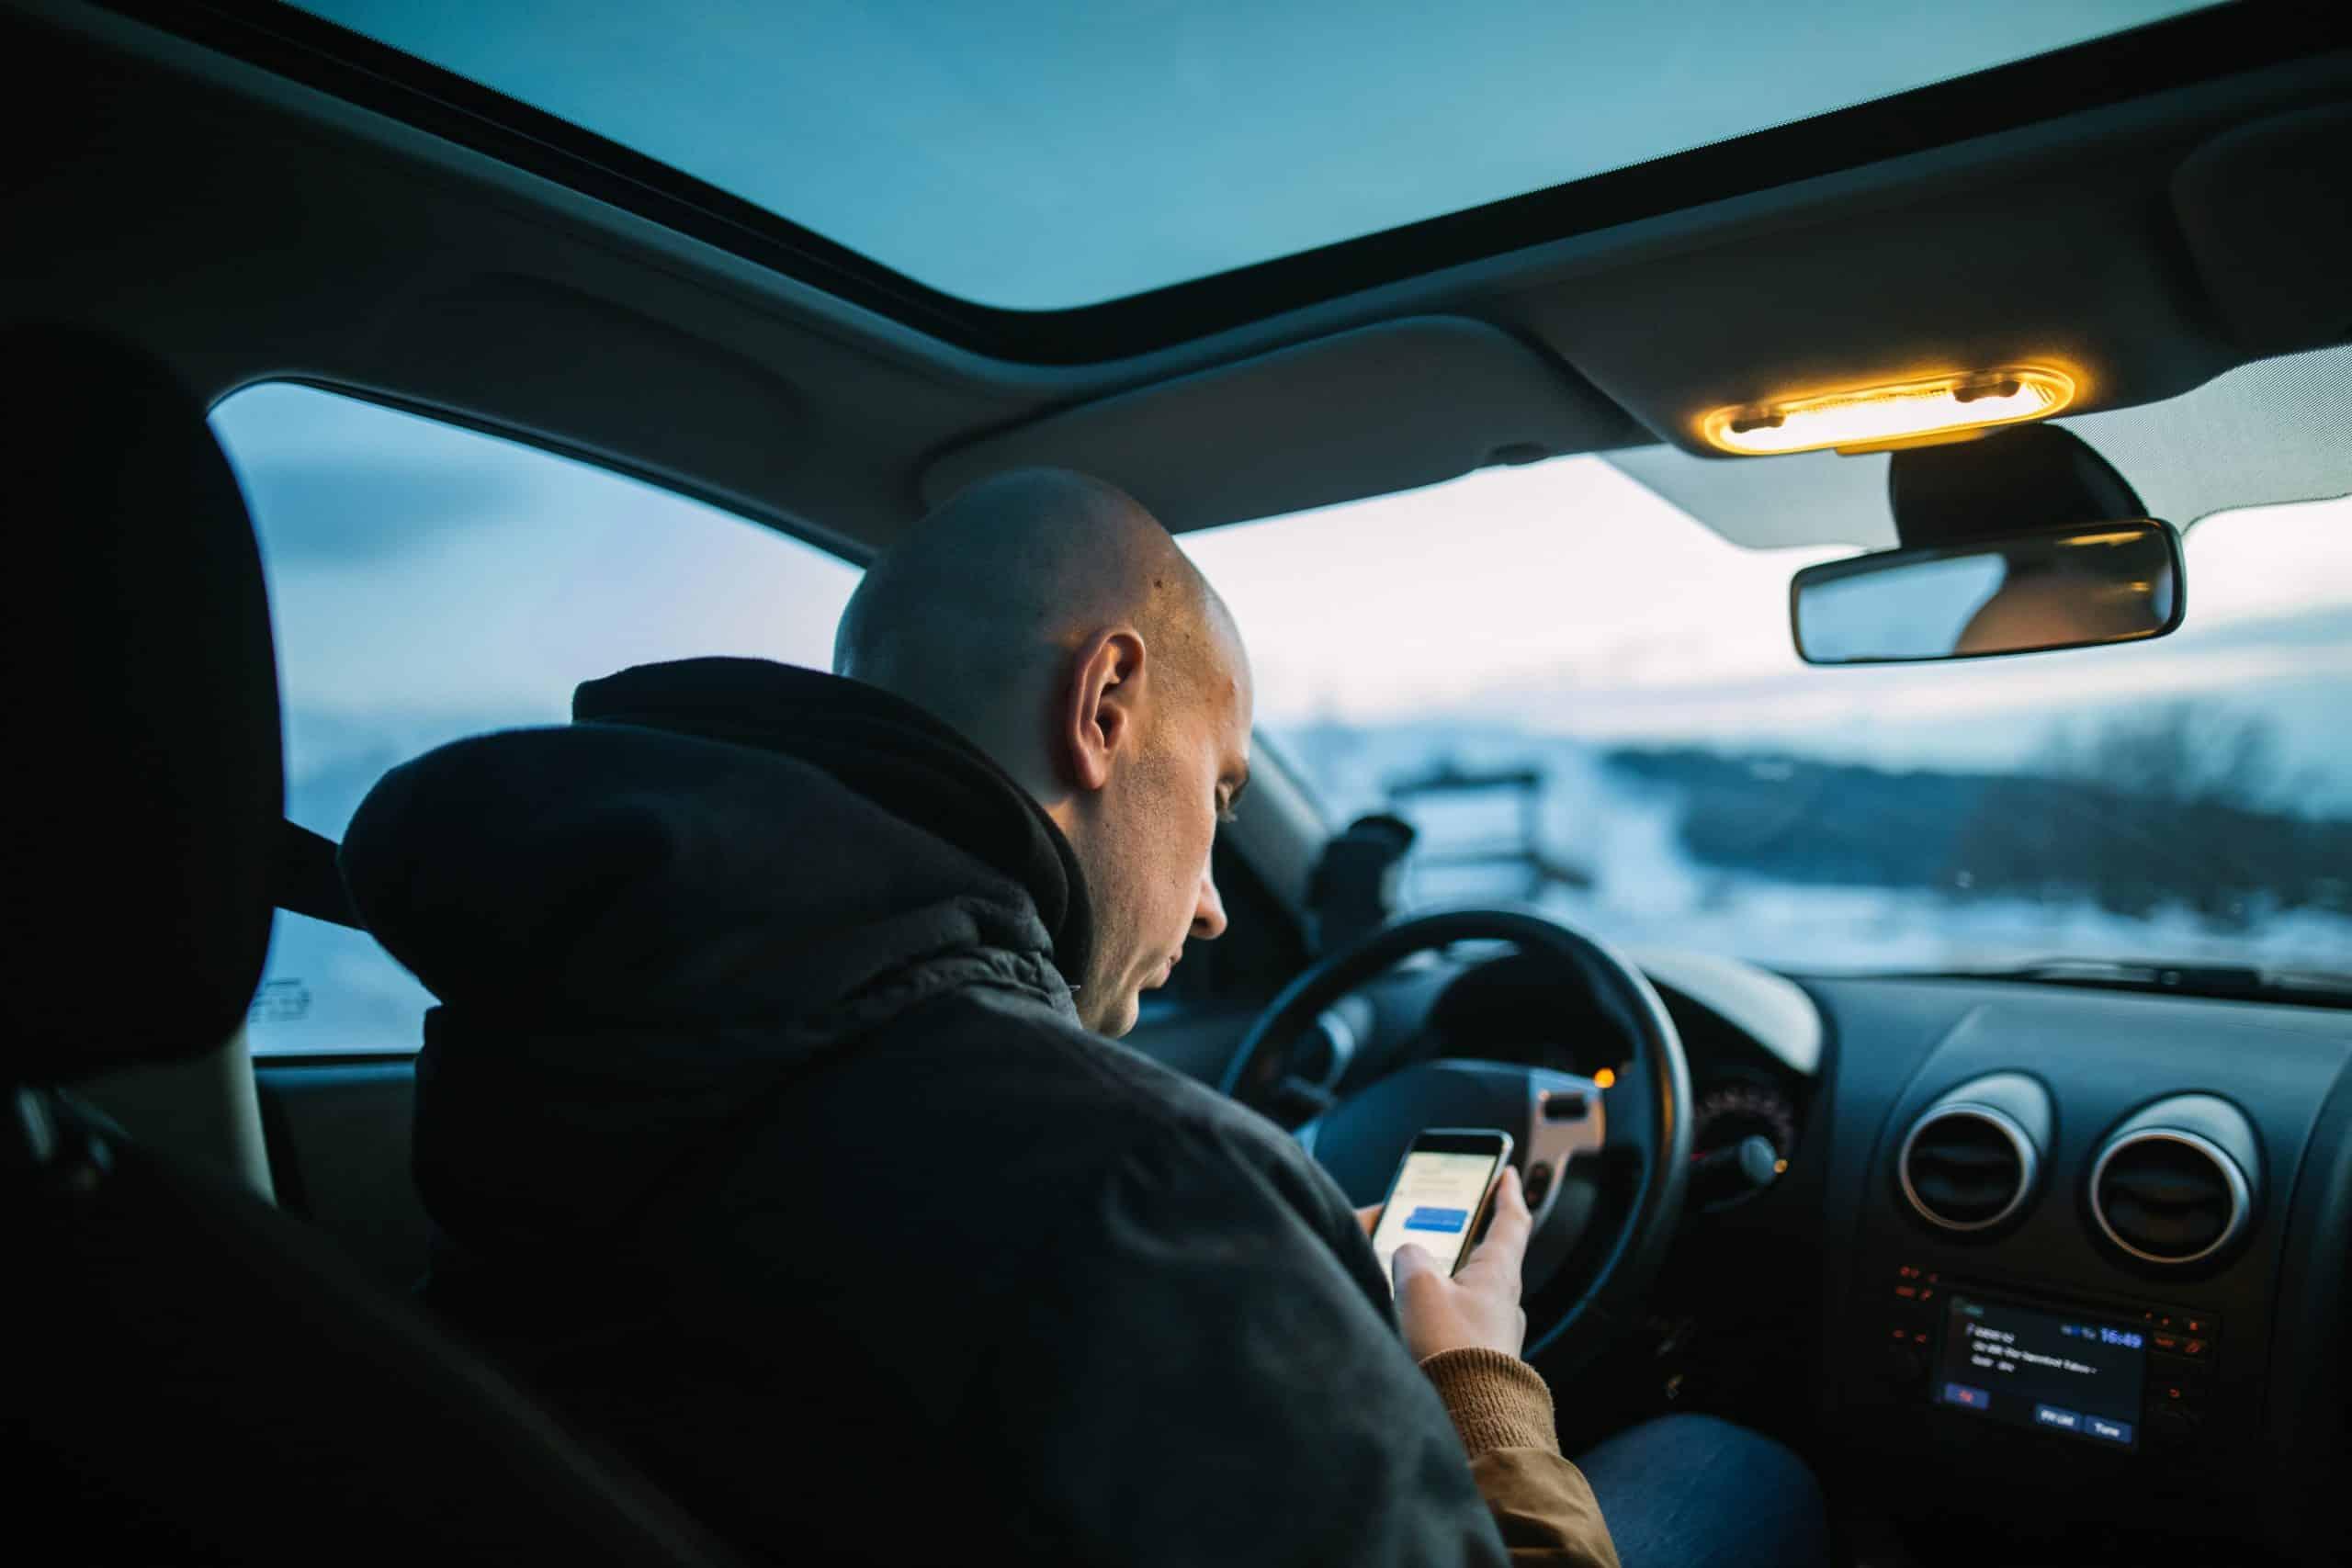 man sitting in car using his smart phone